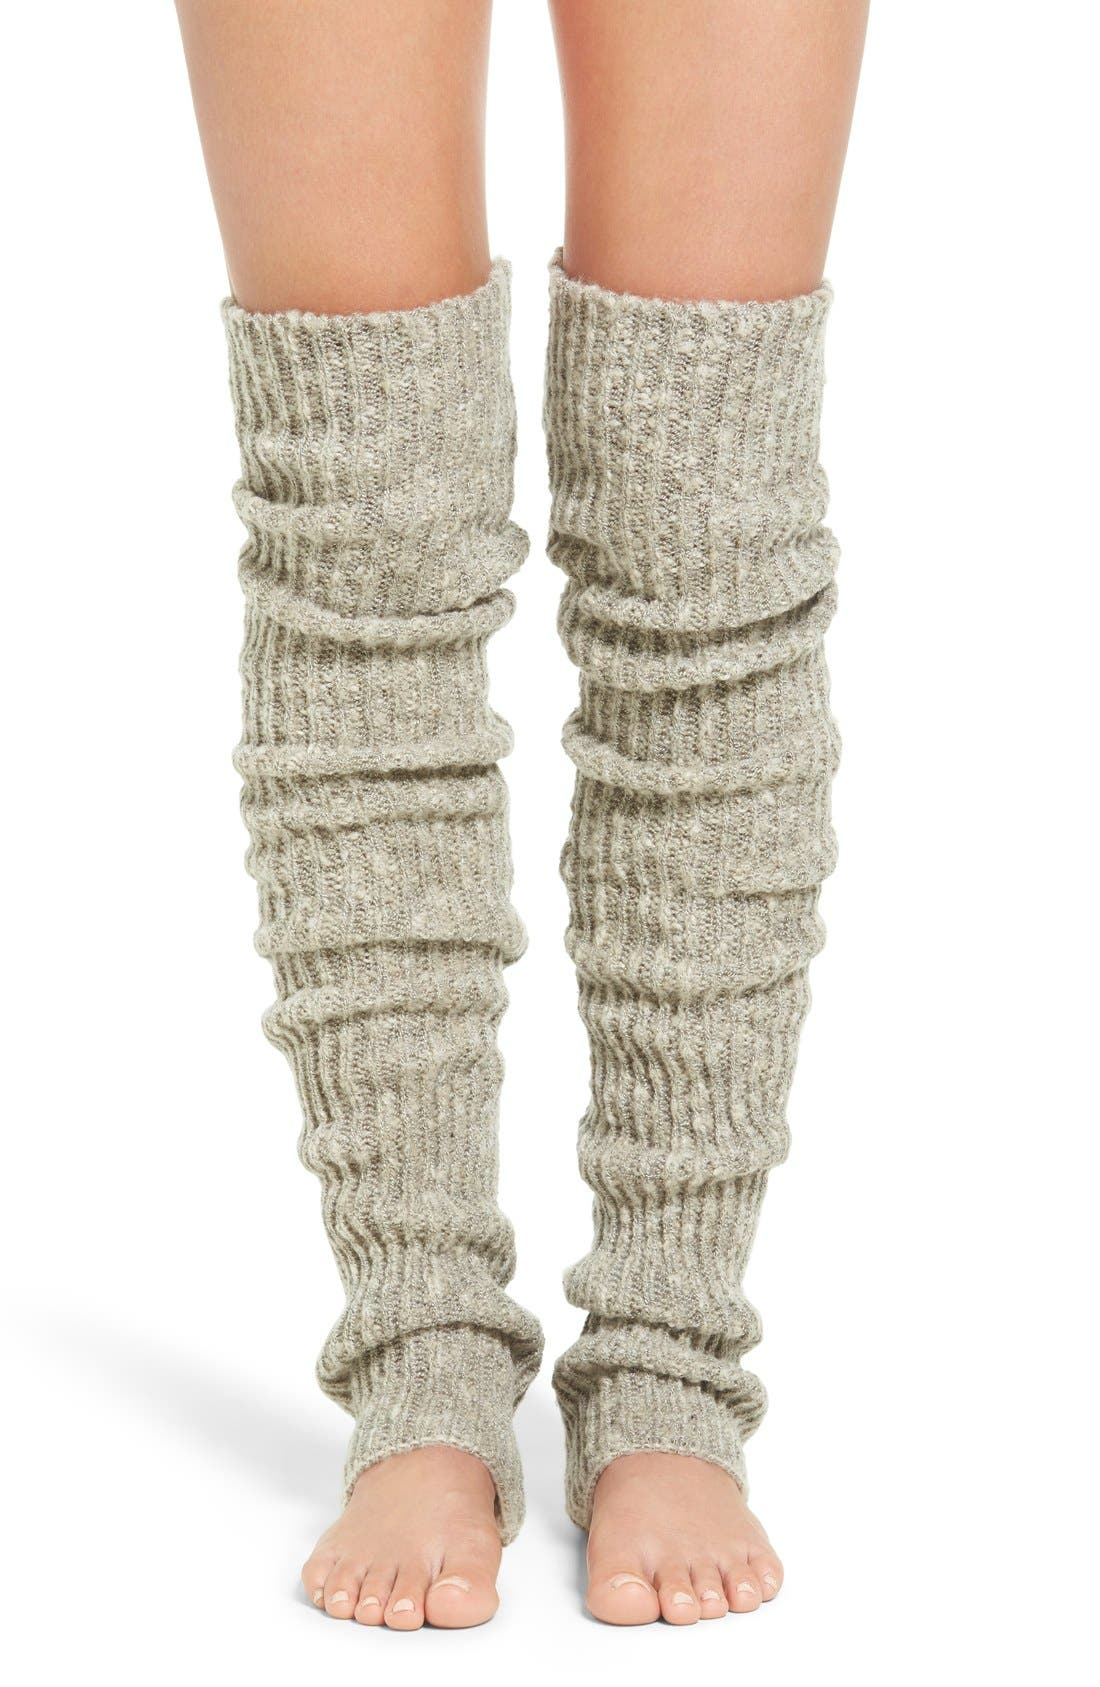 Alternate Image 1 Selected - Lemon 'Flurry' Rib Knit Leg Warmers